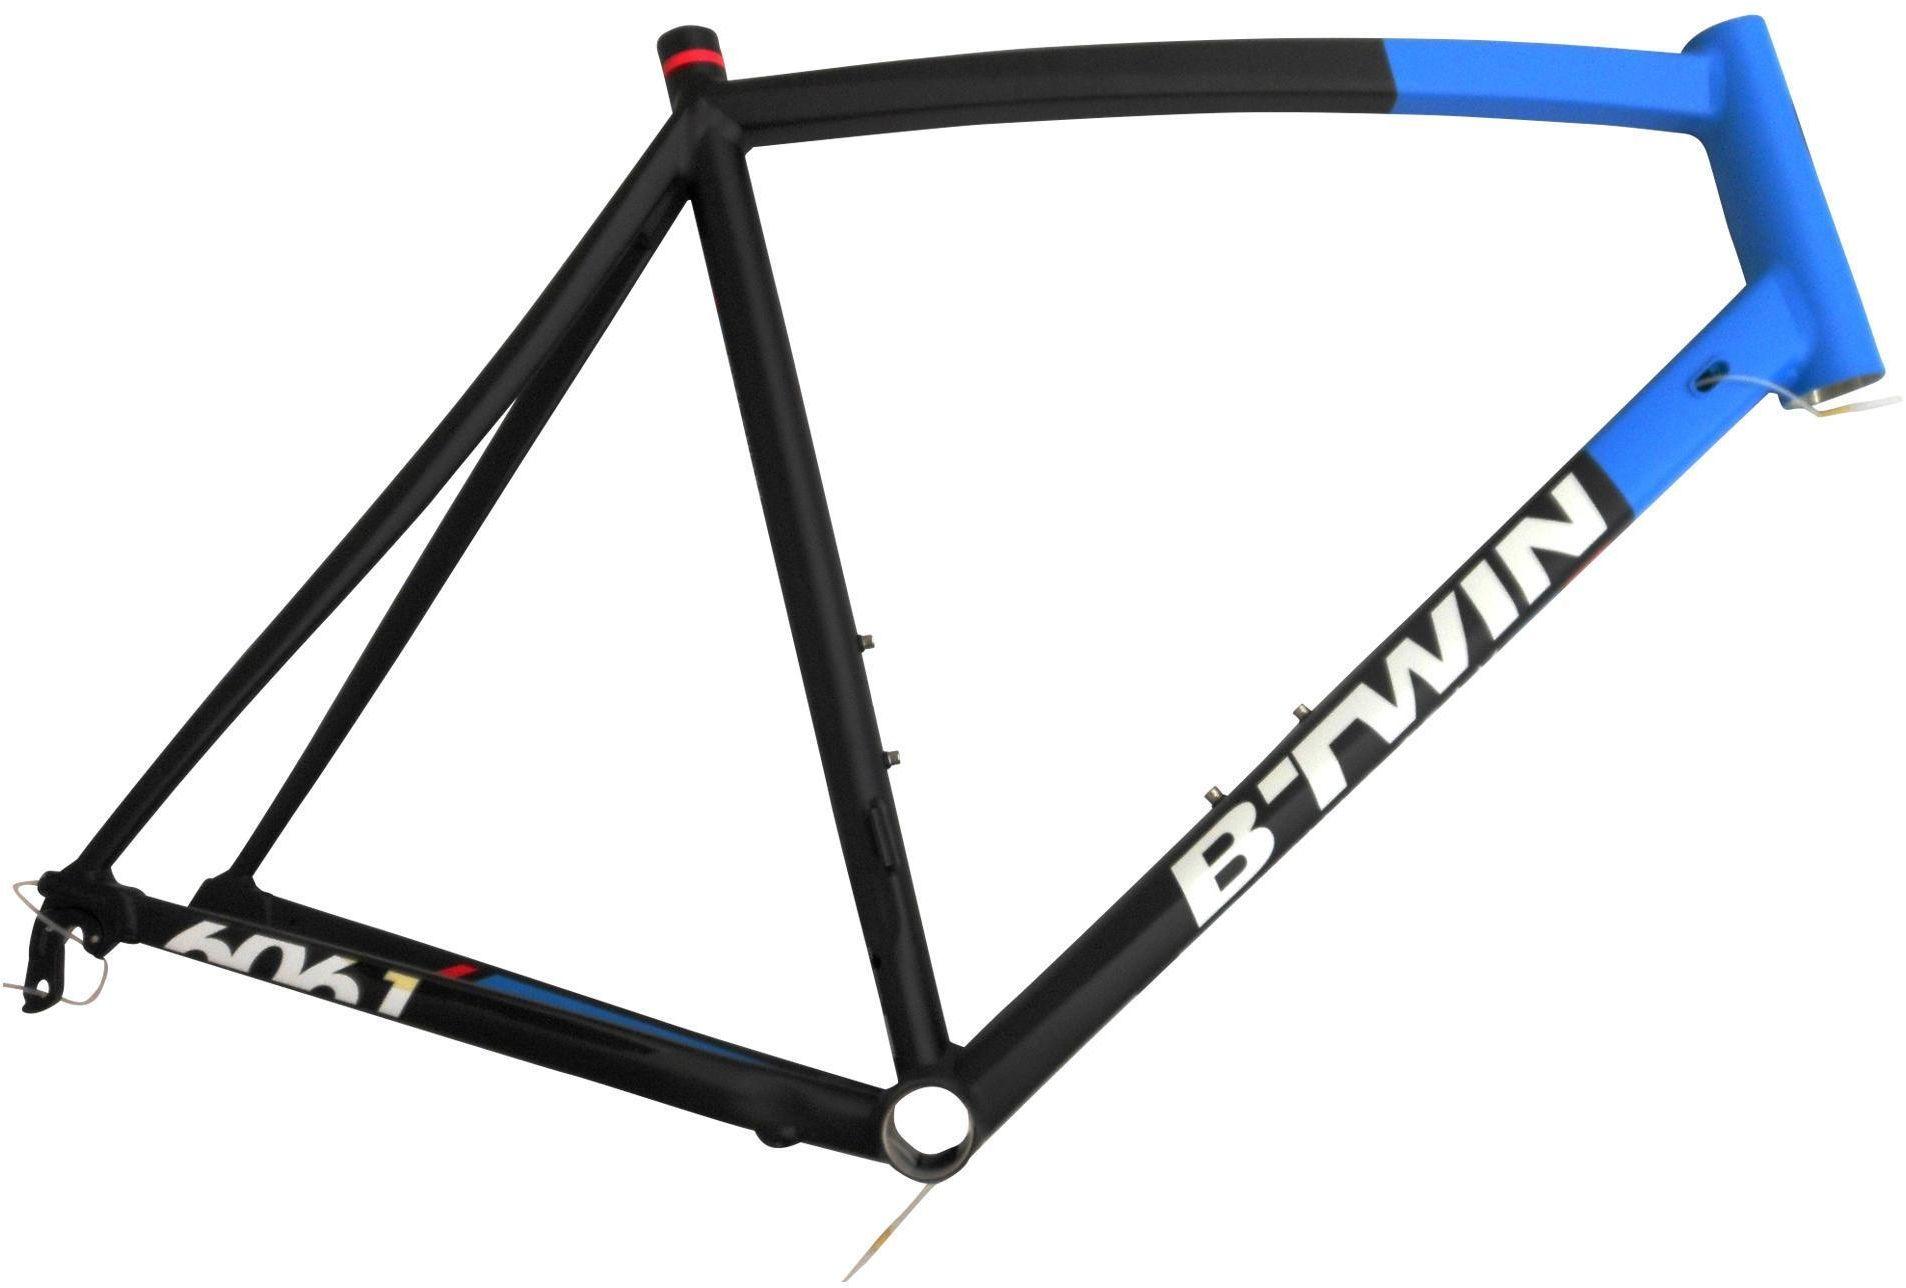 rama do roweru ultra 720af 2015